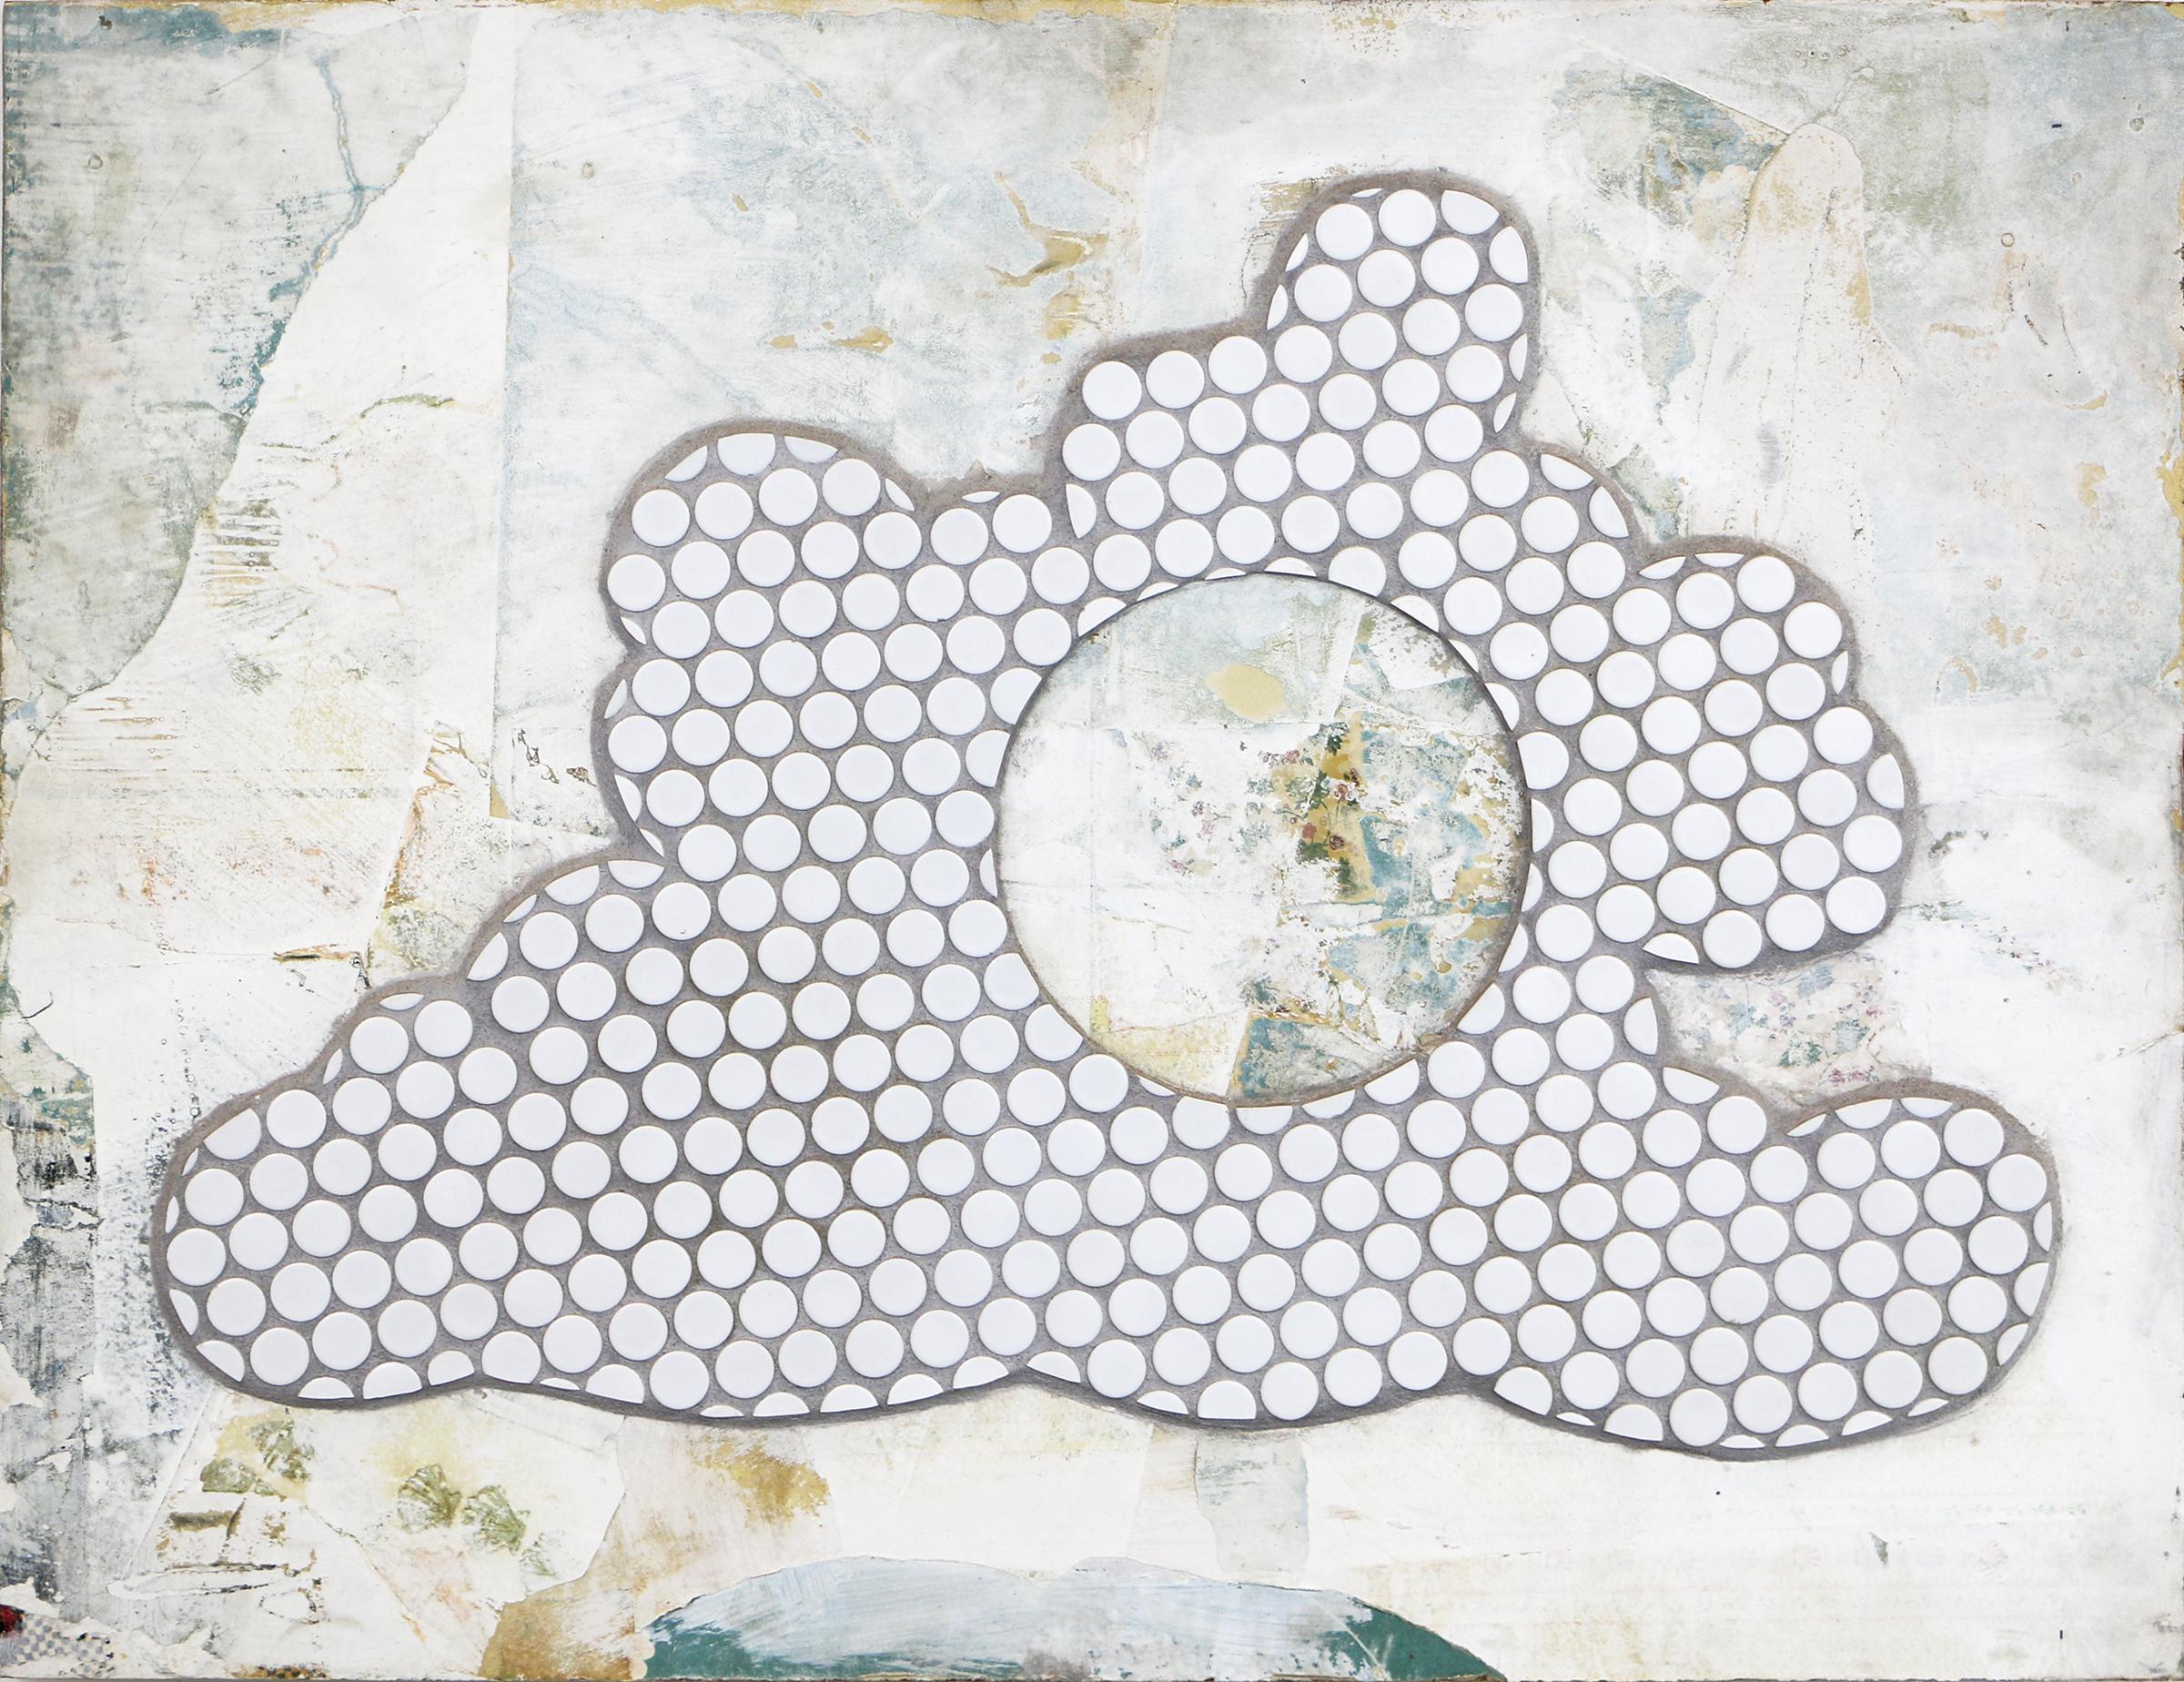 Cloudy, glassy.Reif.2015.lrg